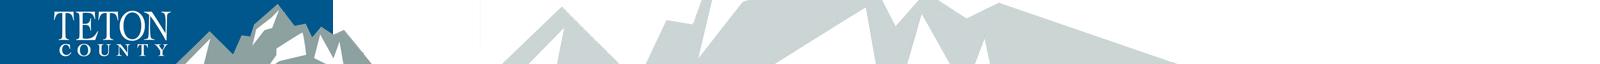 Teton County, WY logo